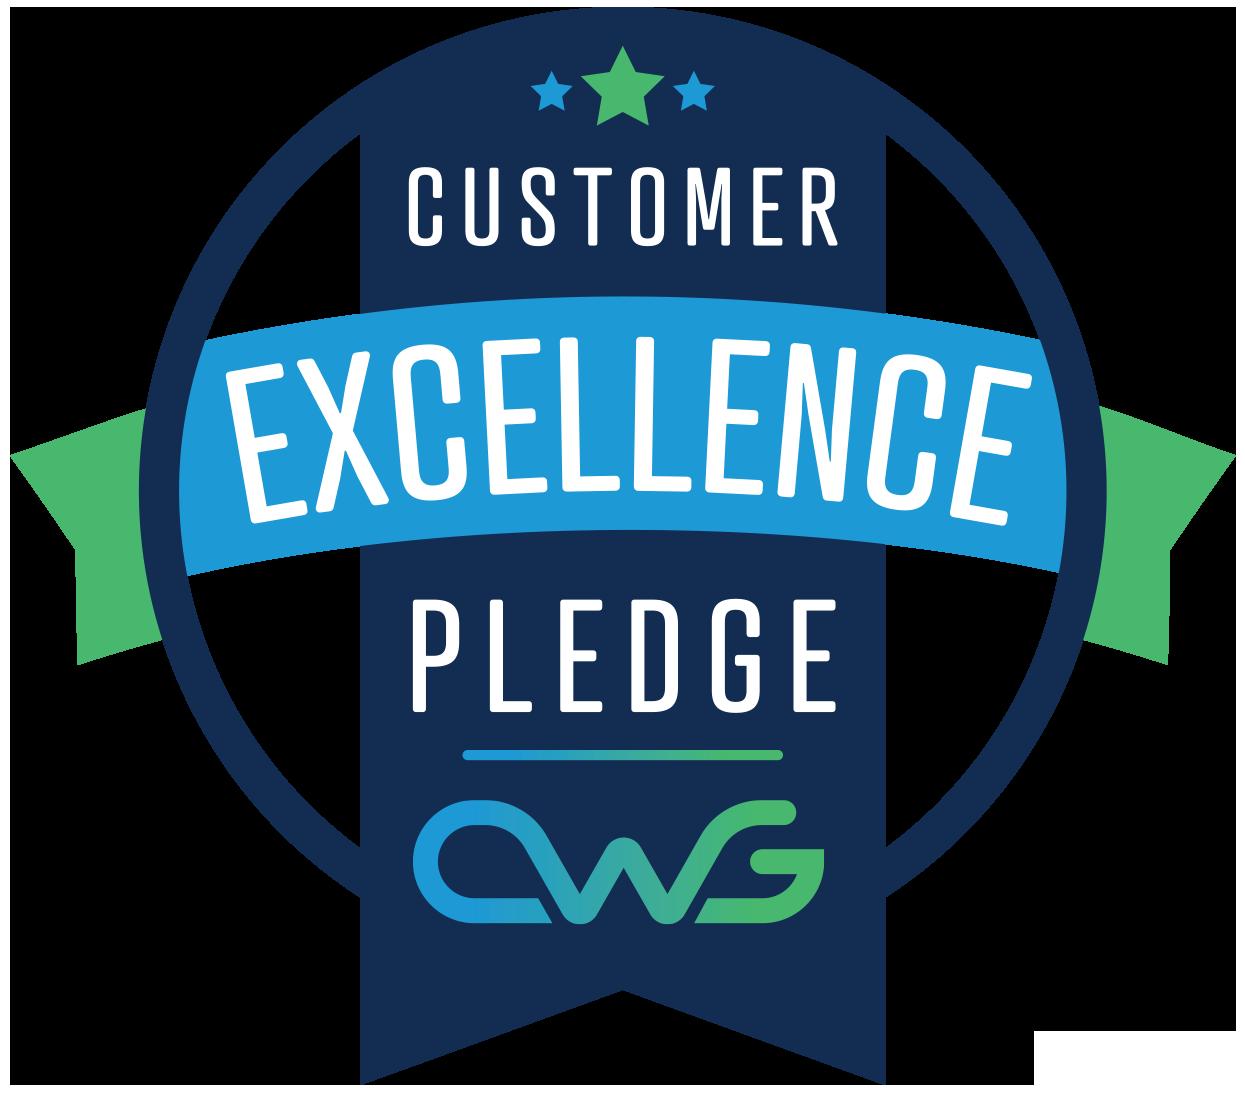 Customer Excellence Pledge badge